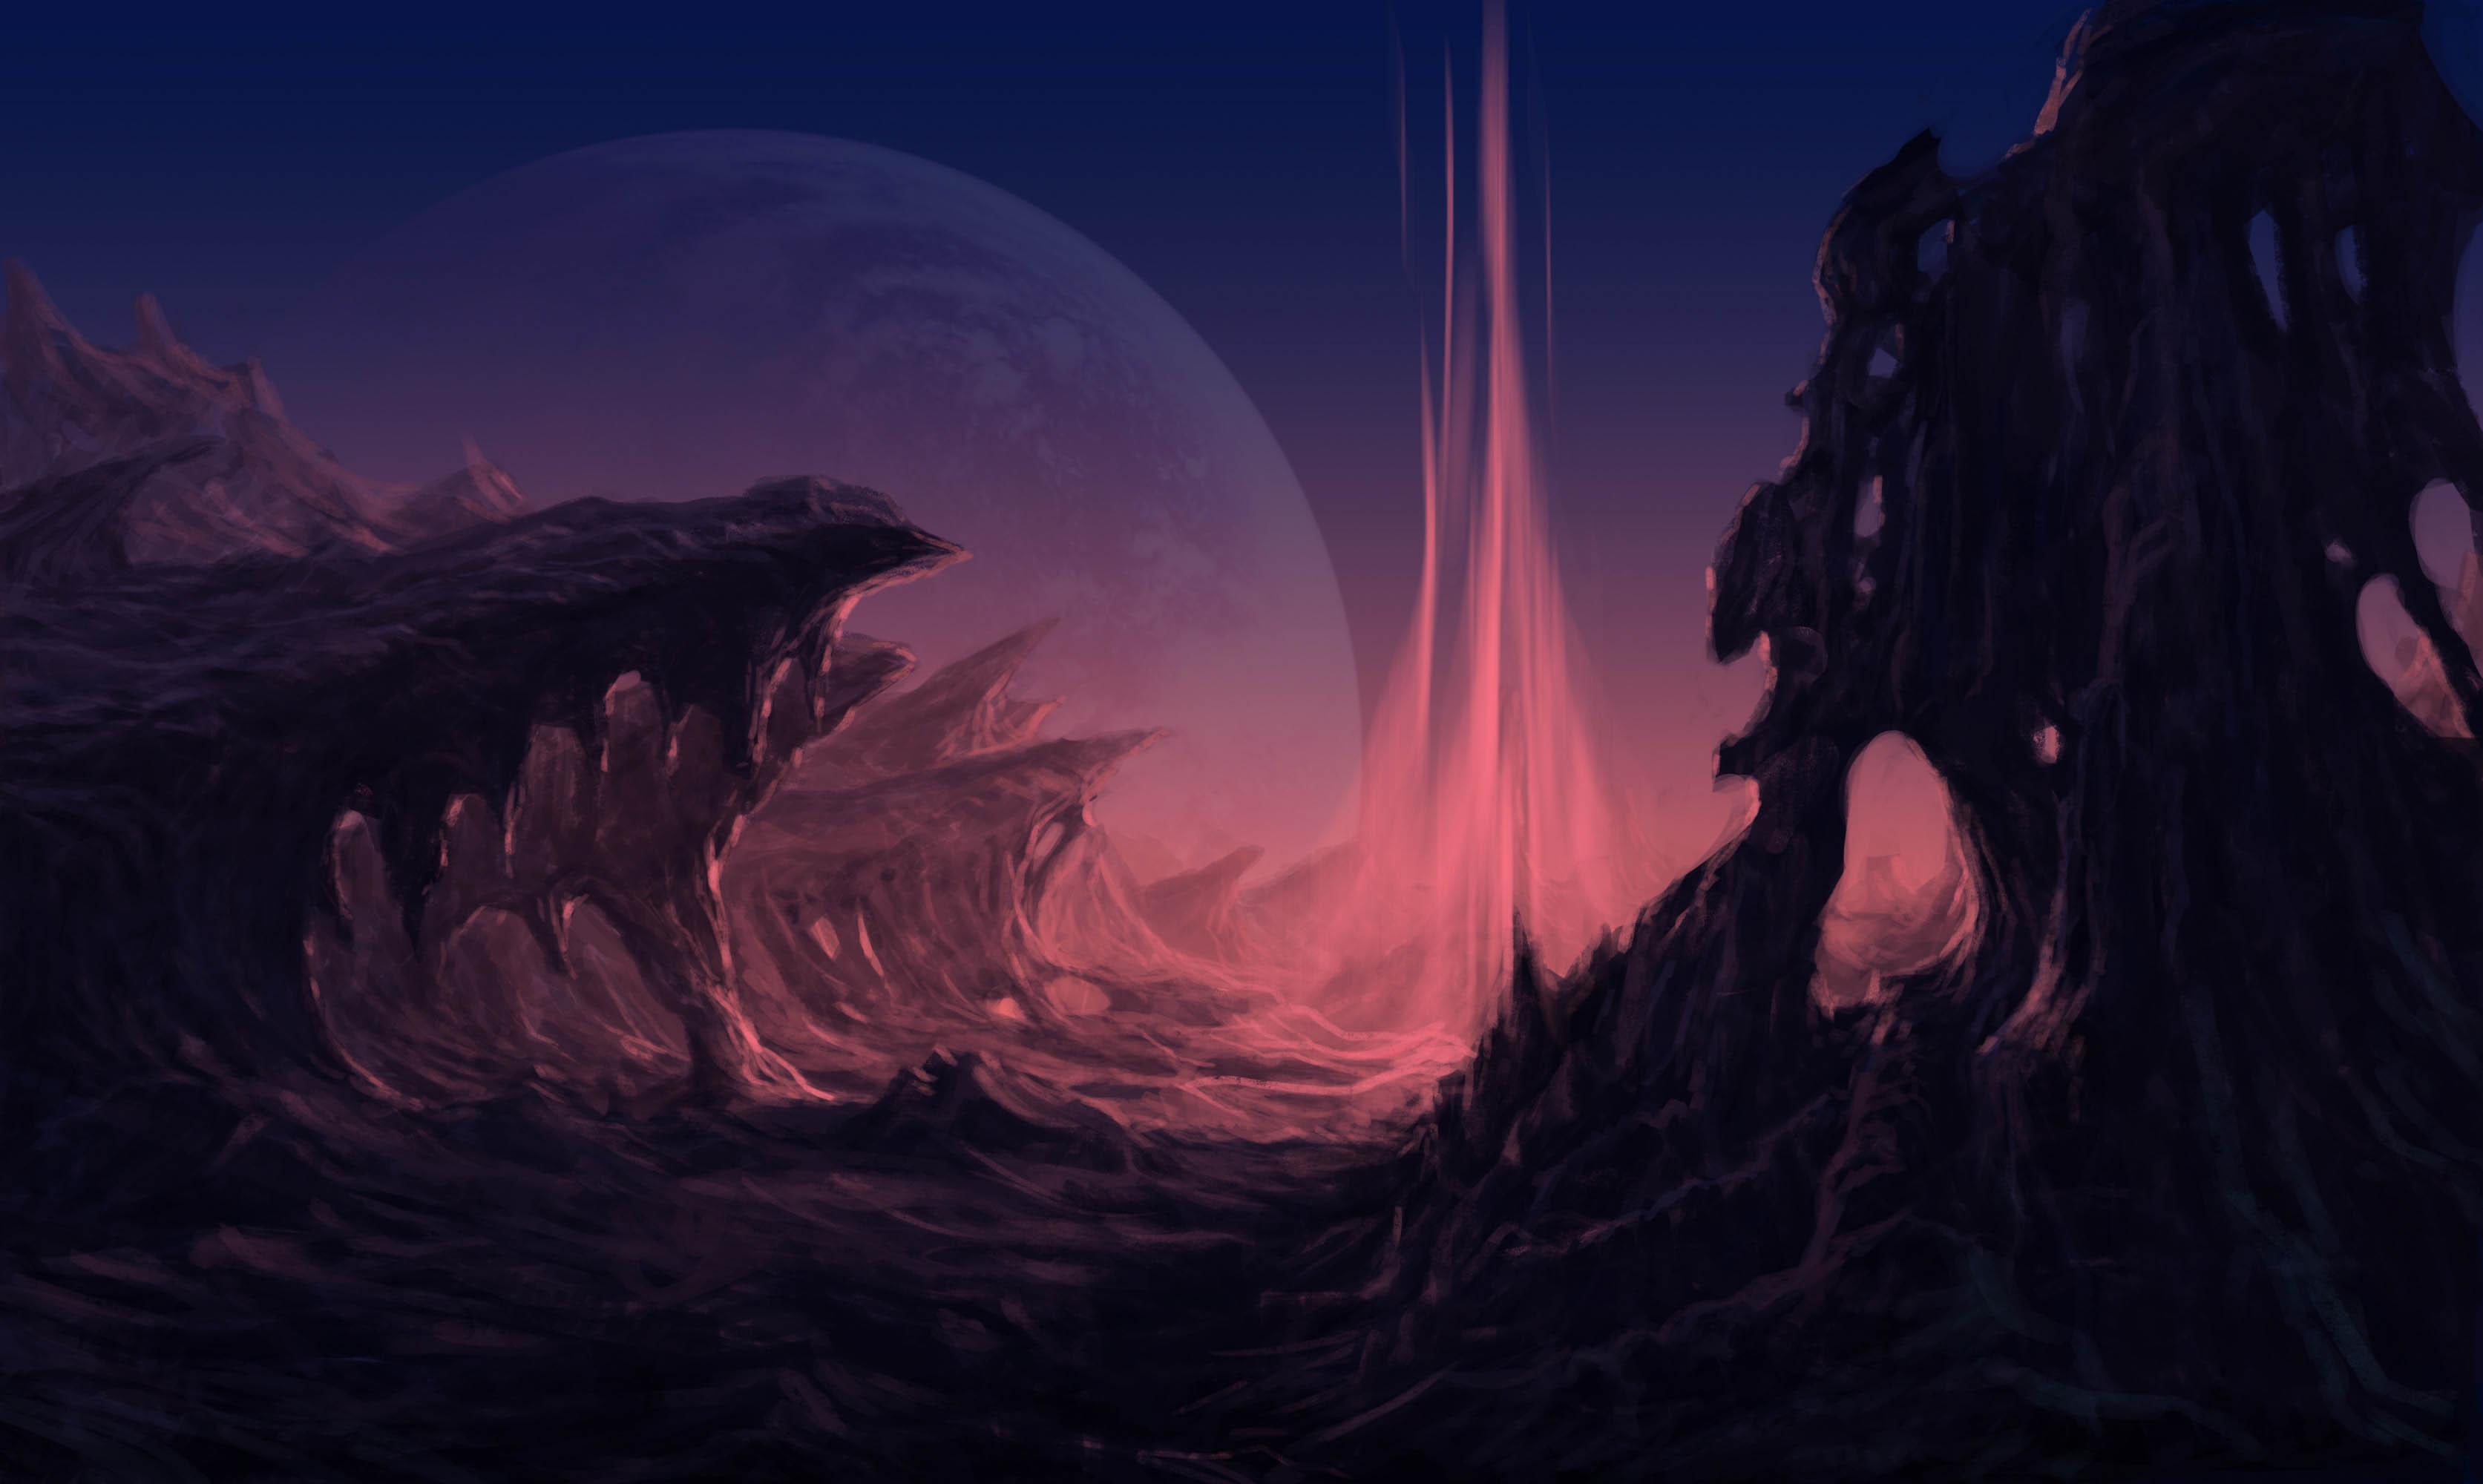 matte painting digital art alien planet